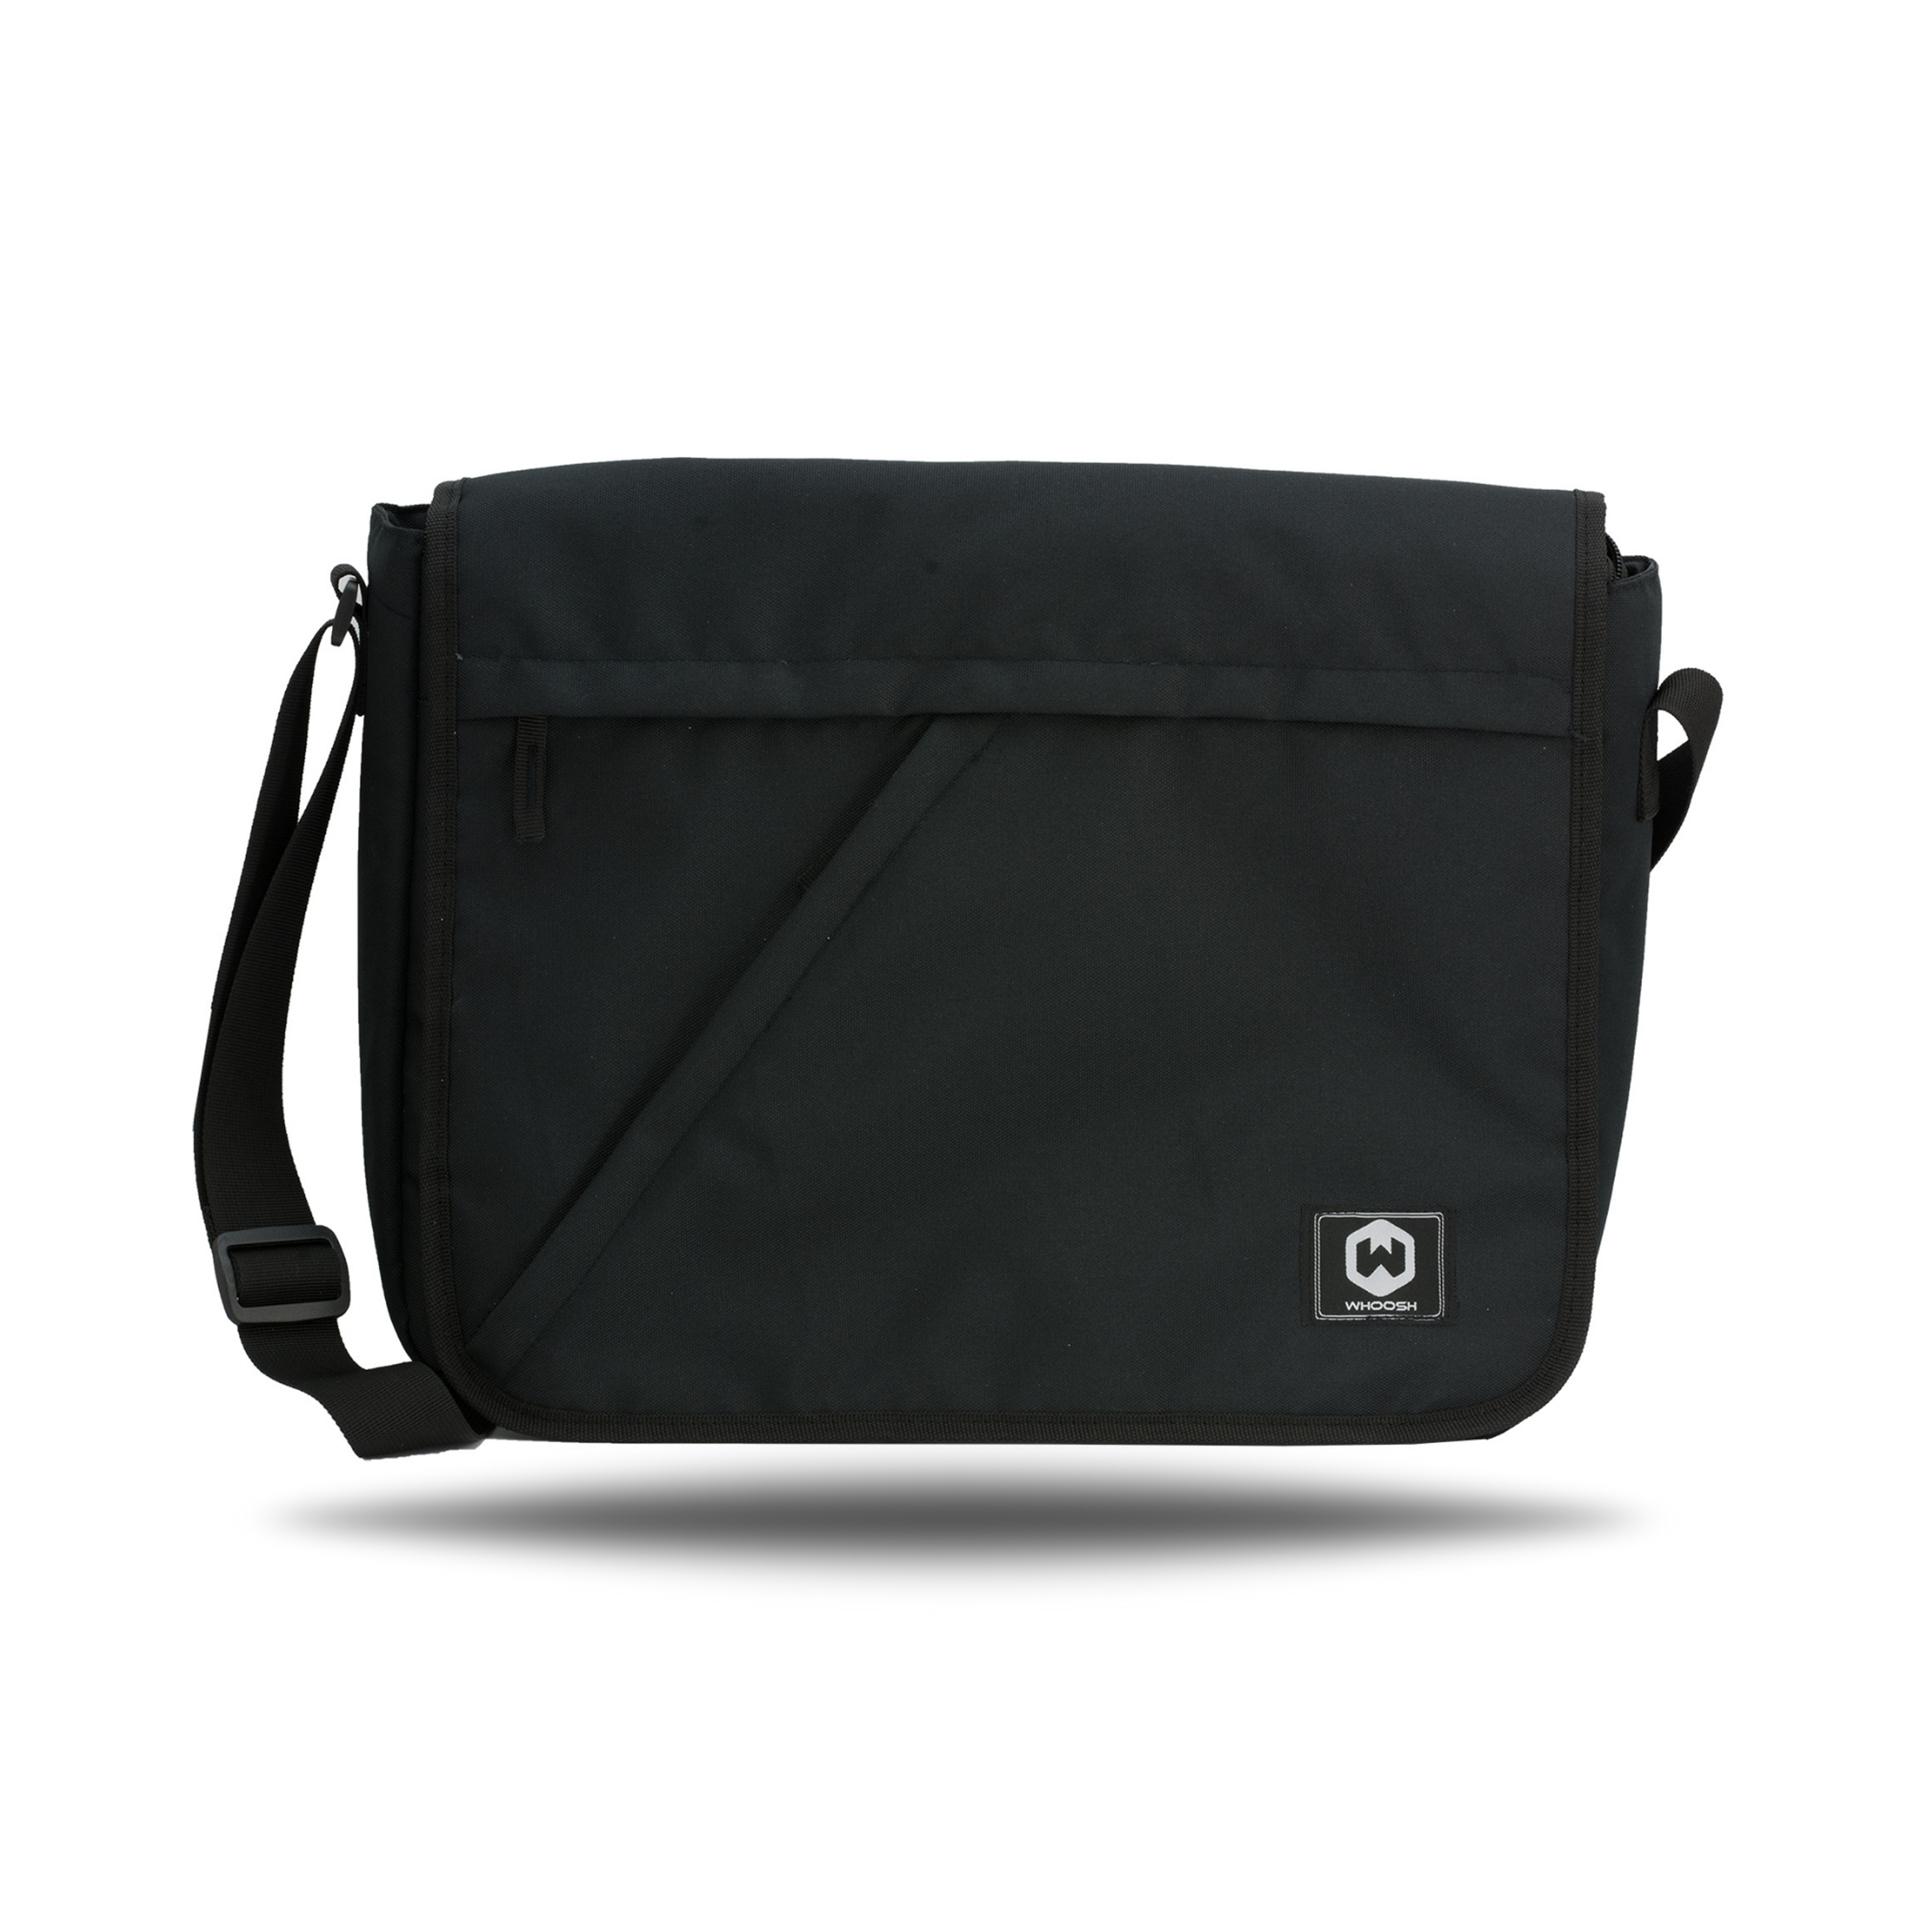 Slika za kategorijo Whoosh torbice i novčanici